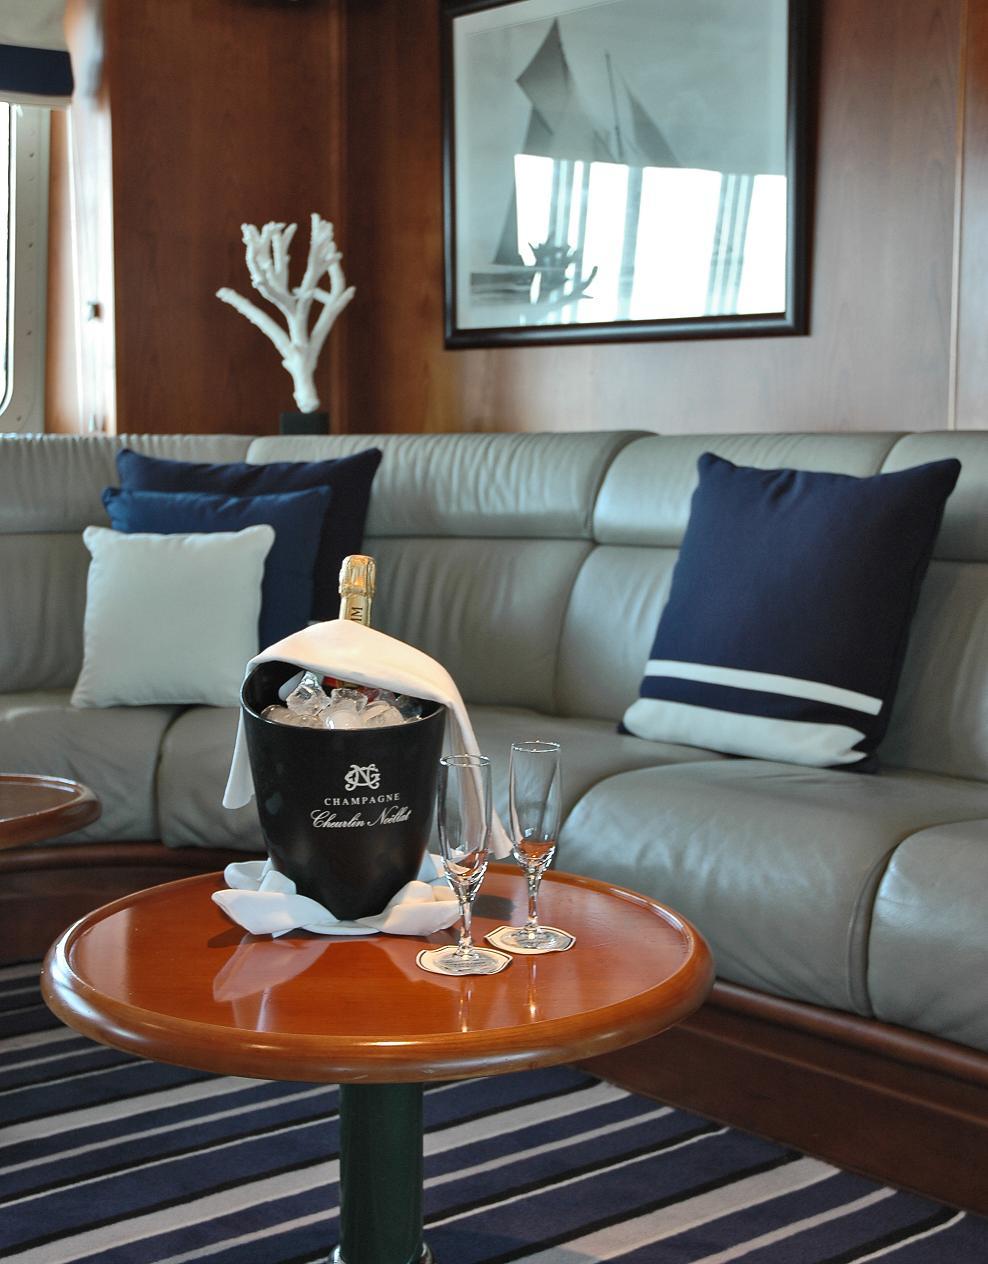 Ponant Le Ponant Interior Emeraude Lounge 3.JPEG